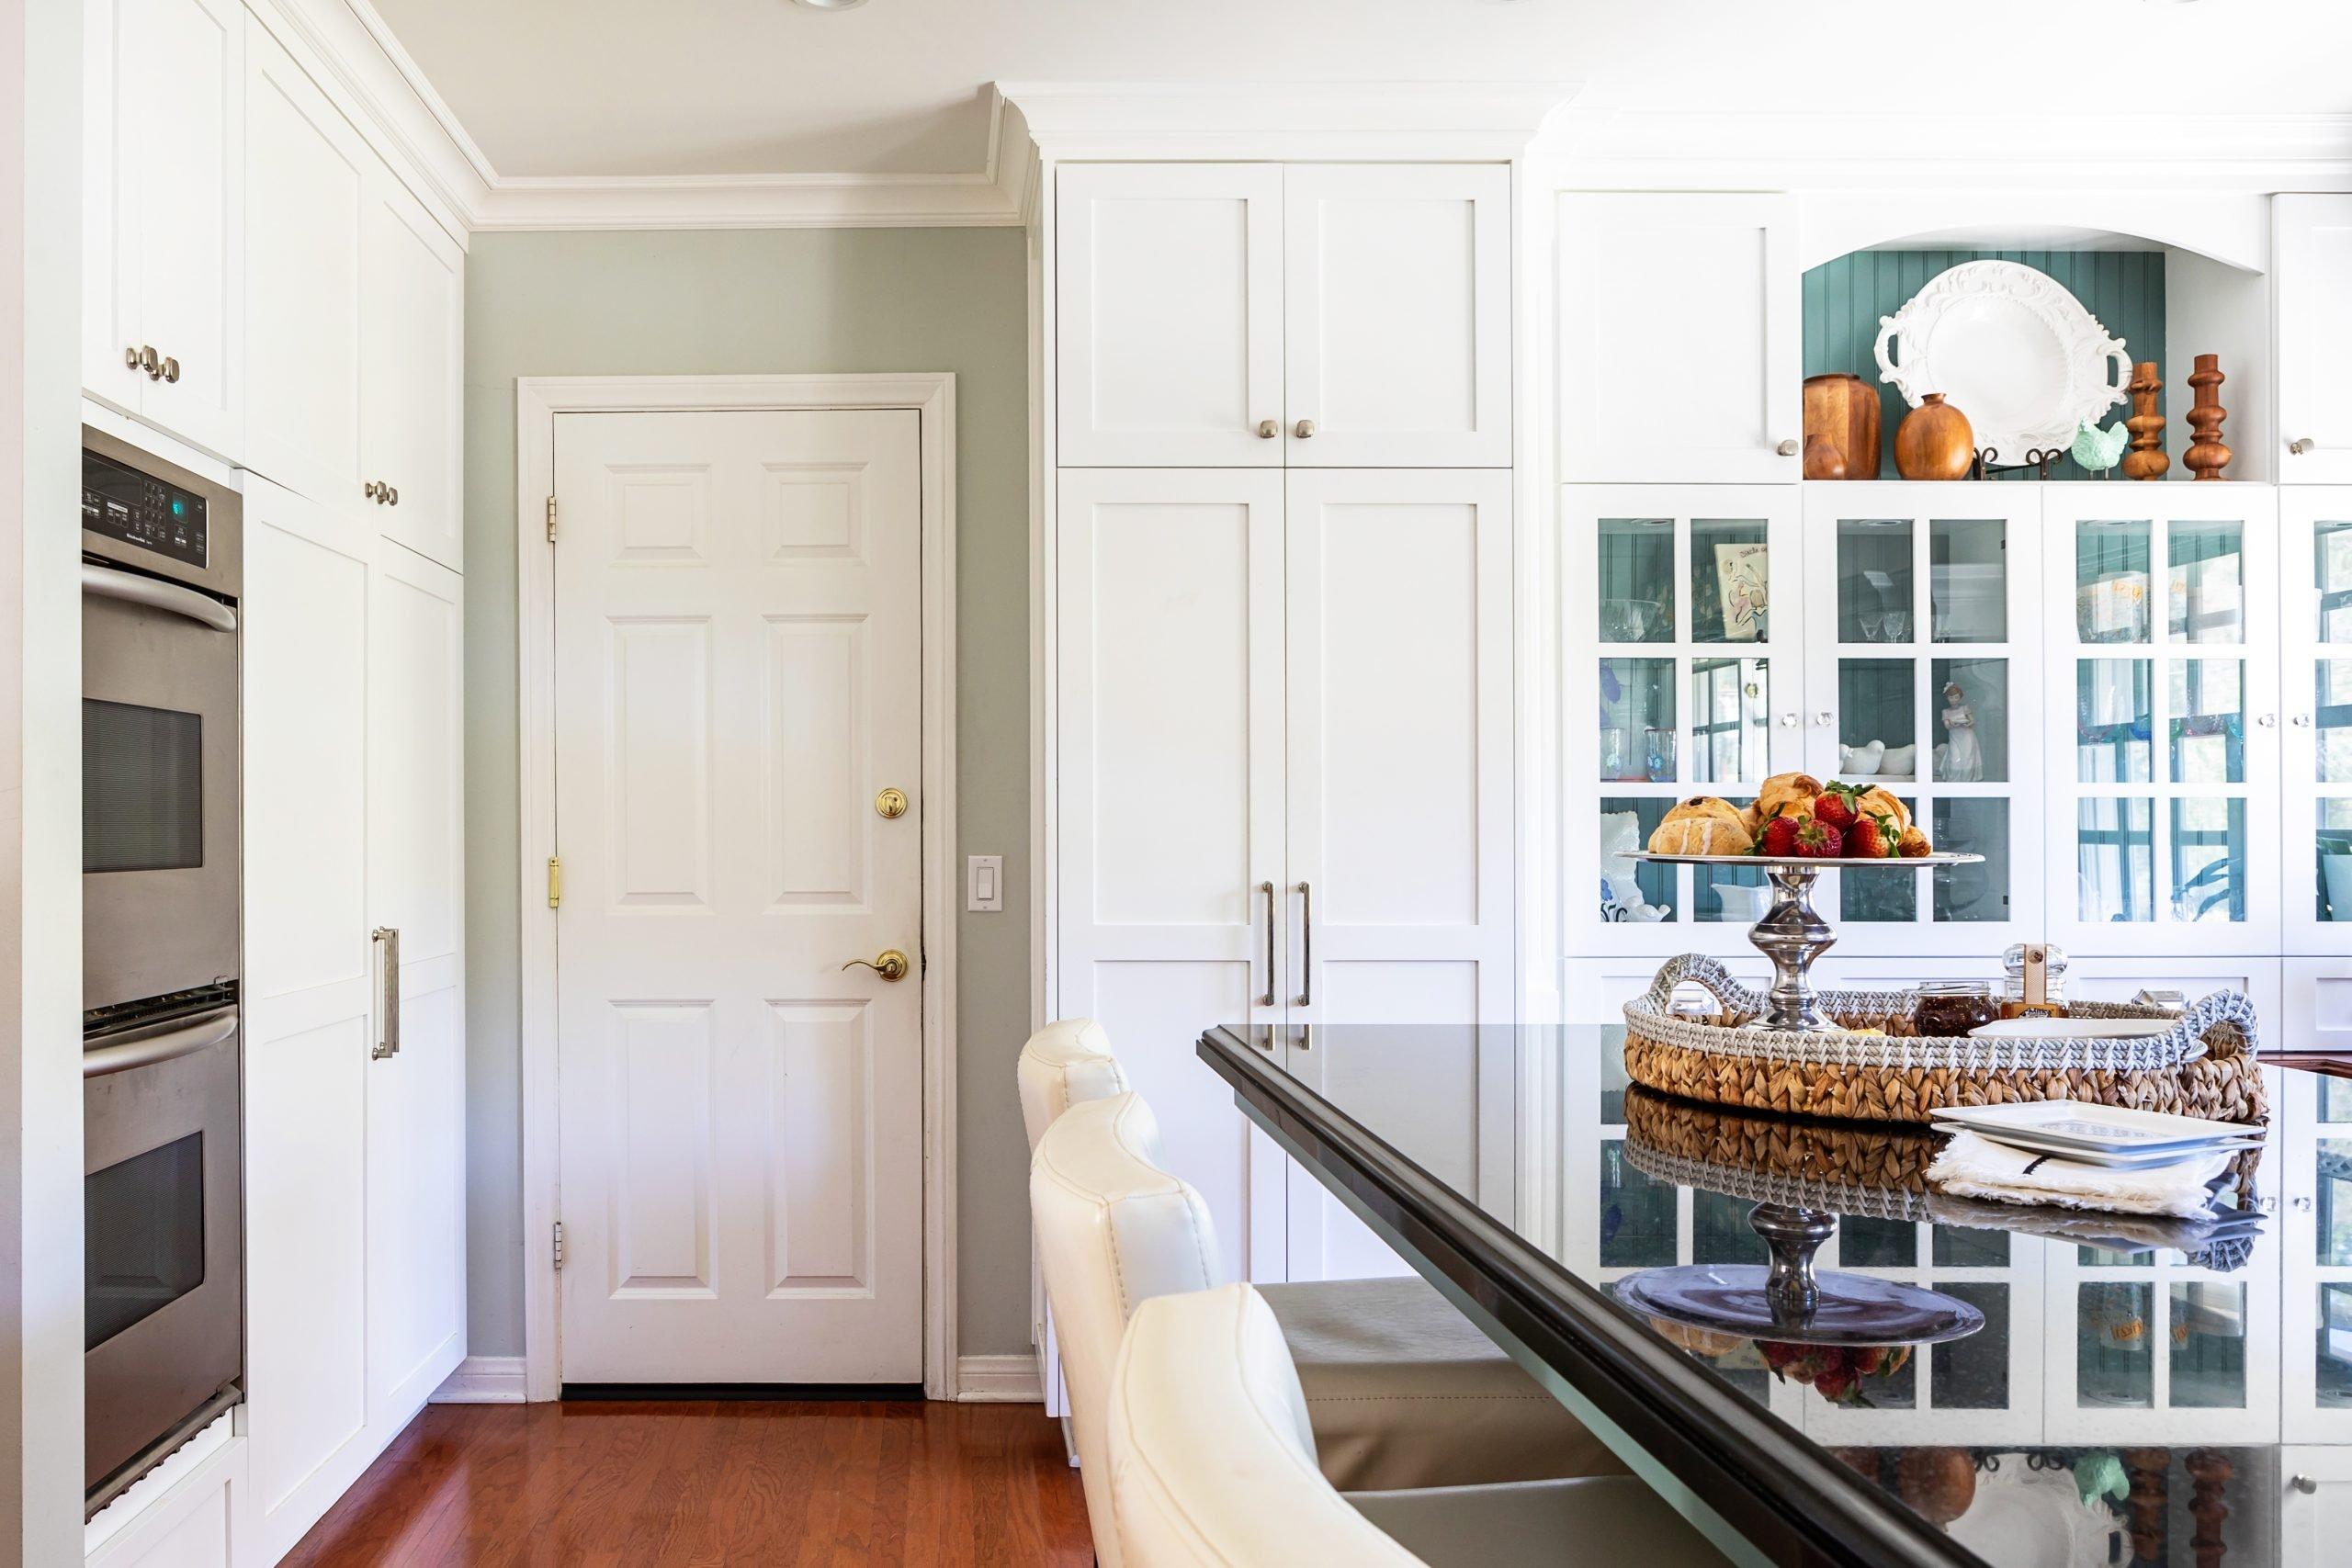 Kitchen Renovation in Hidden Hills, CA - JLK interiors - bright, family-friendly kitchen